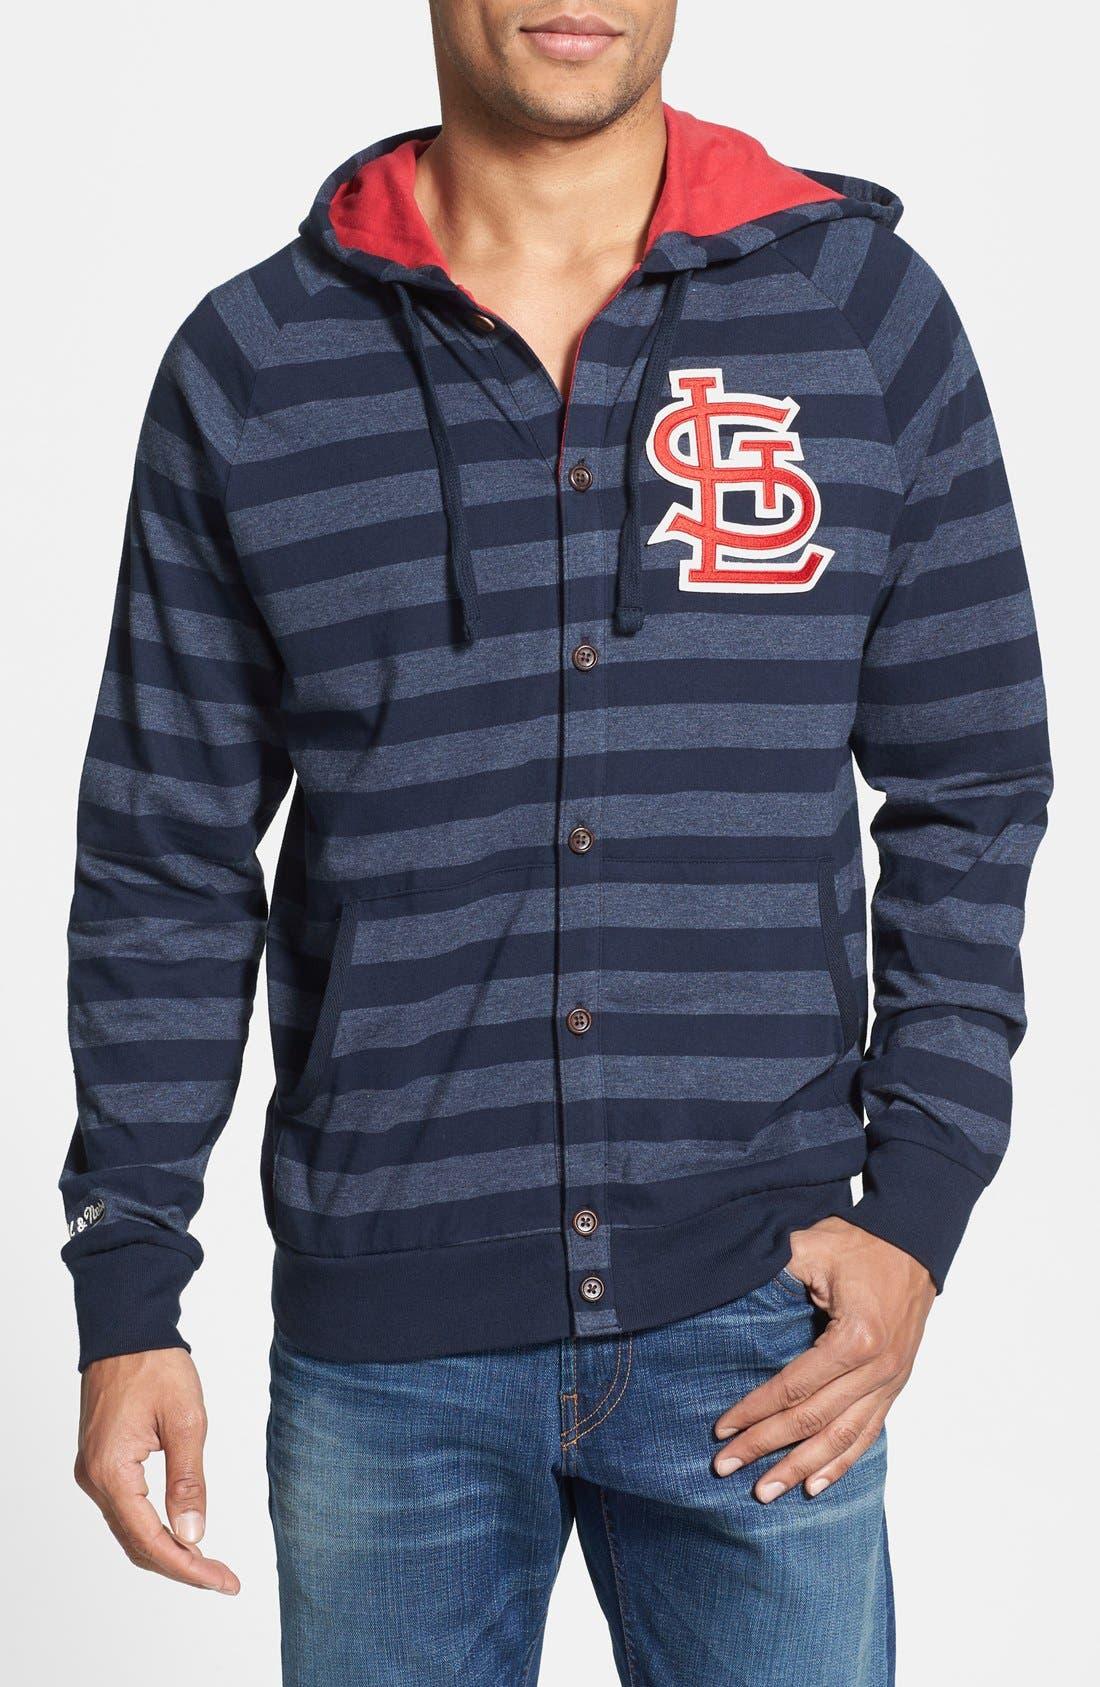 MITCHELL & NESS 'Cardinals' Stripe Button Front Jersey